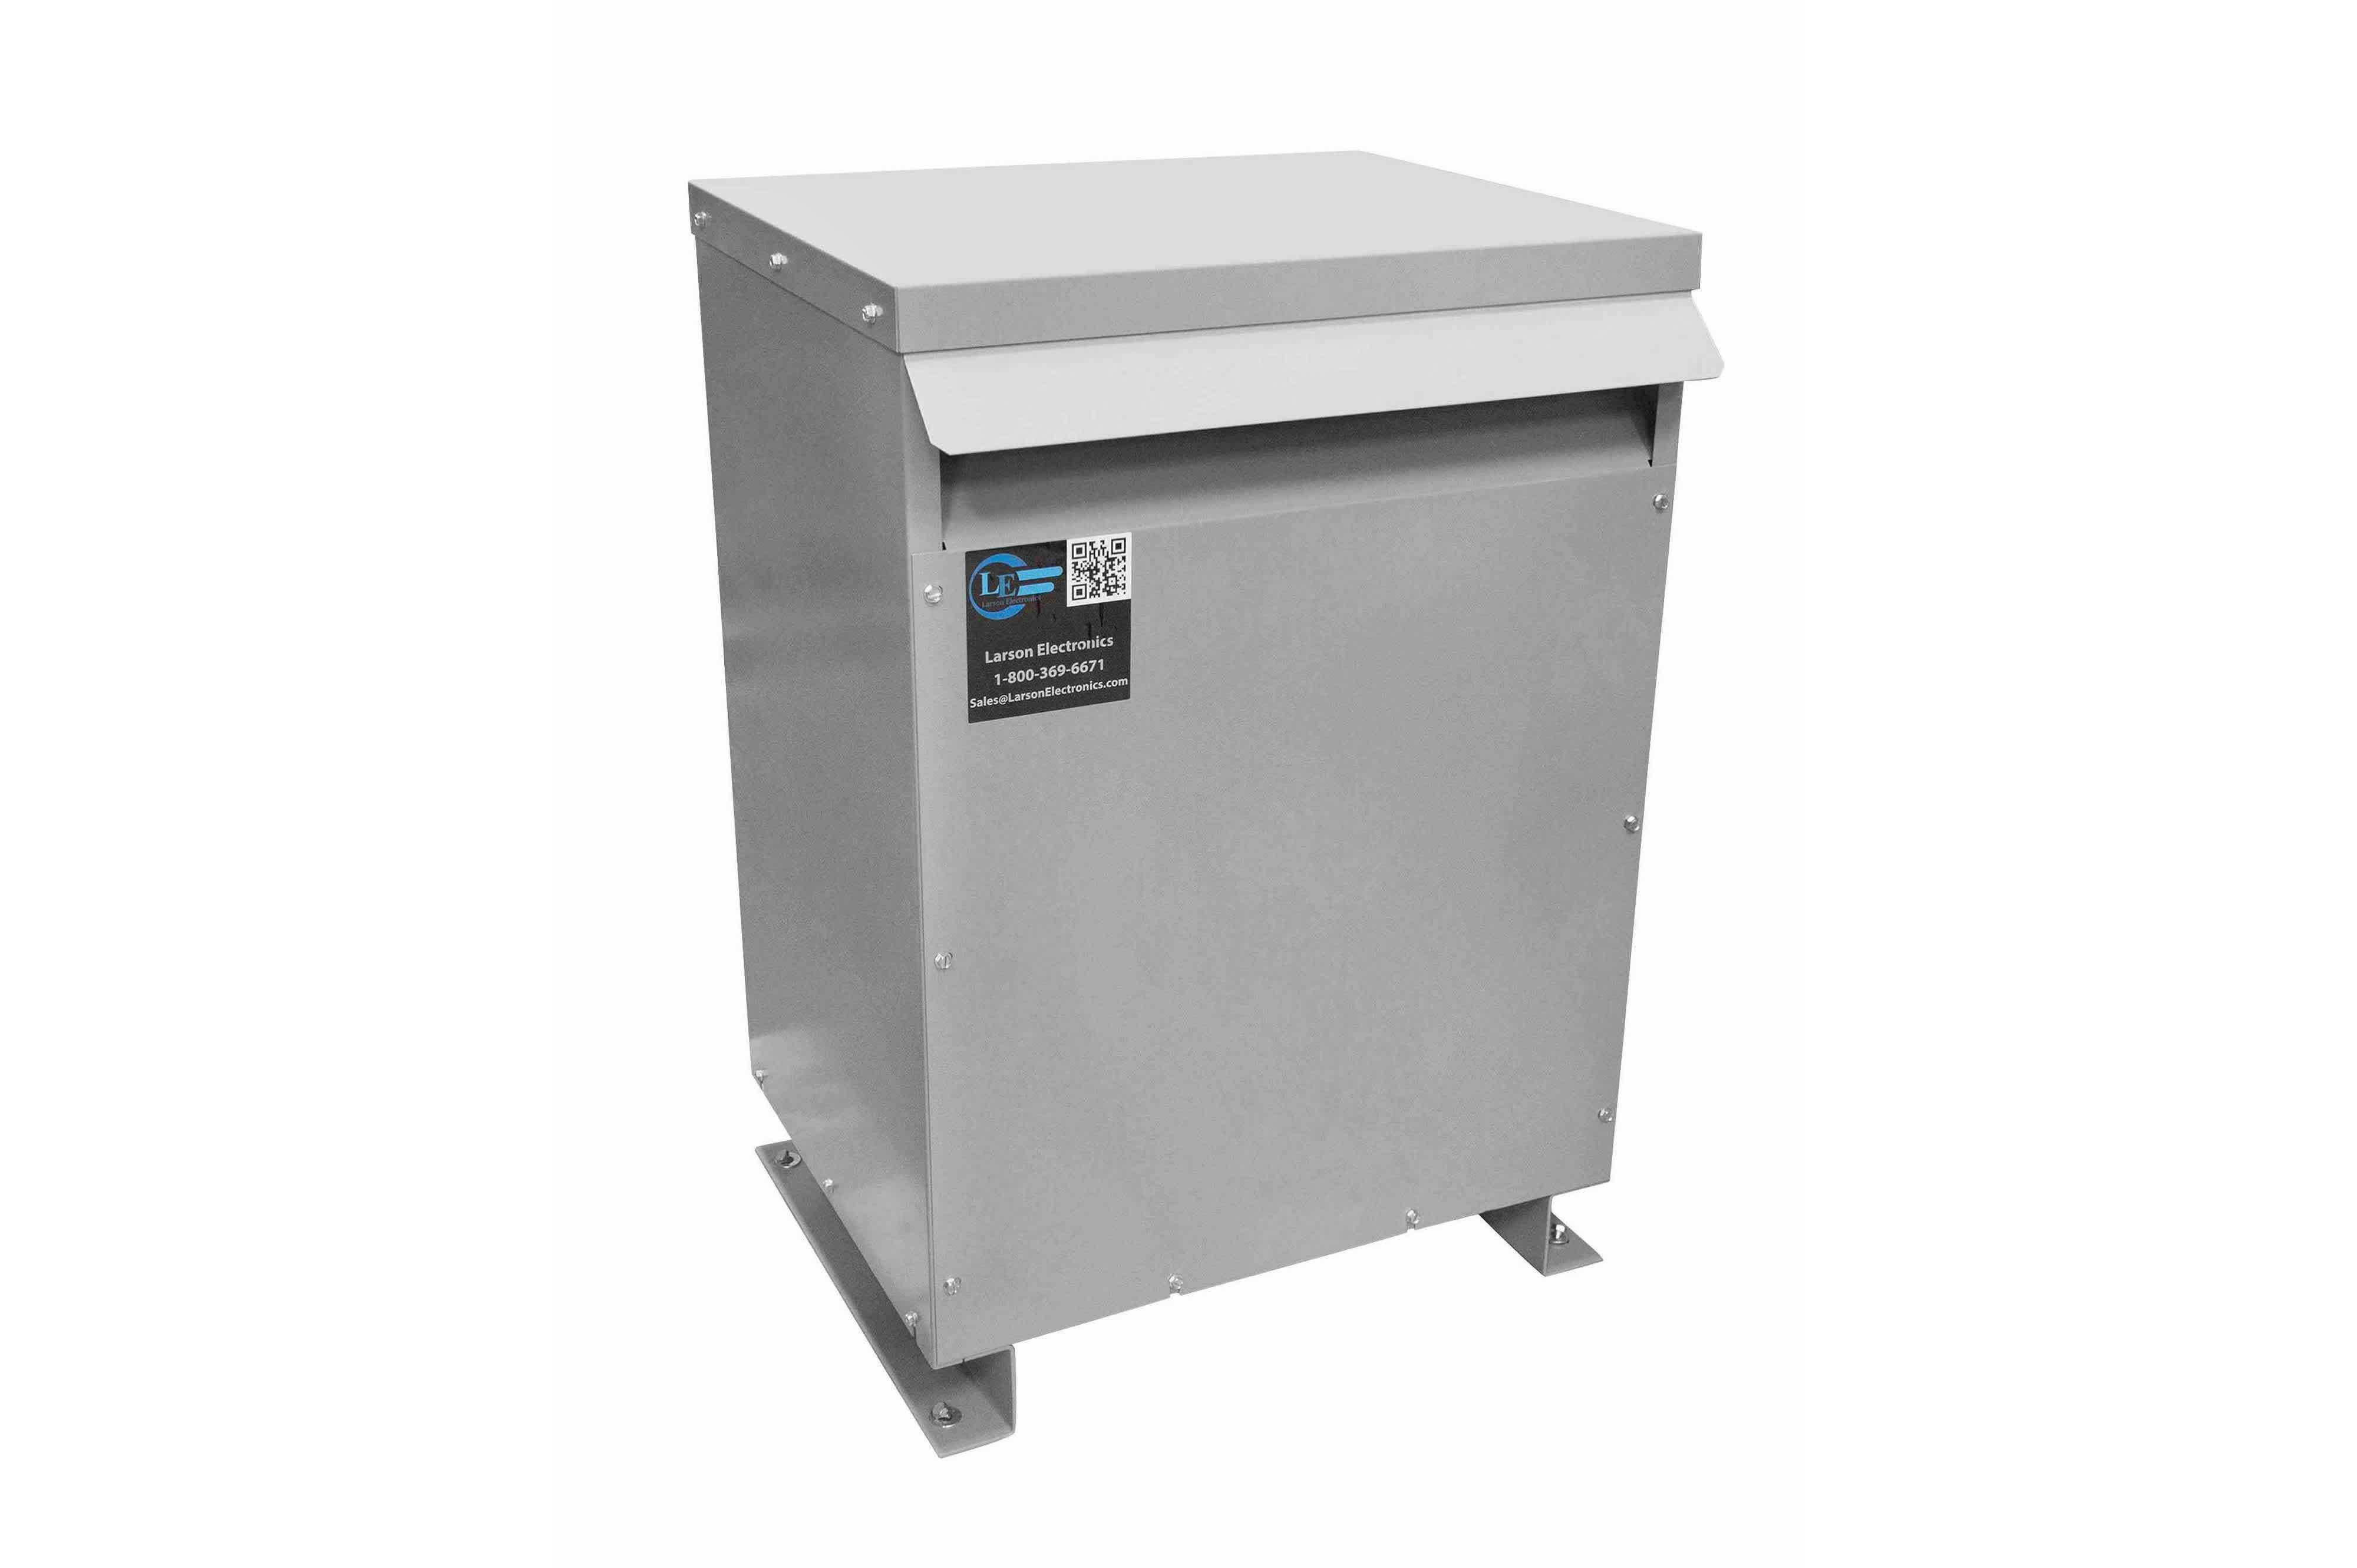 14 kVA 3PH Isolation Transformer, 400V Wye Primary, 208V Delta Secondary, N3R, Ventilated, 60 Hz